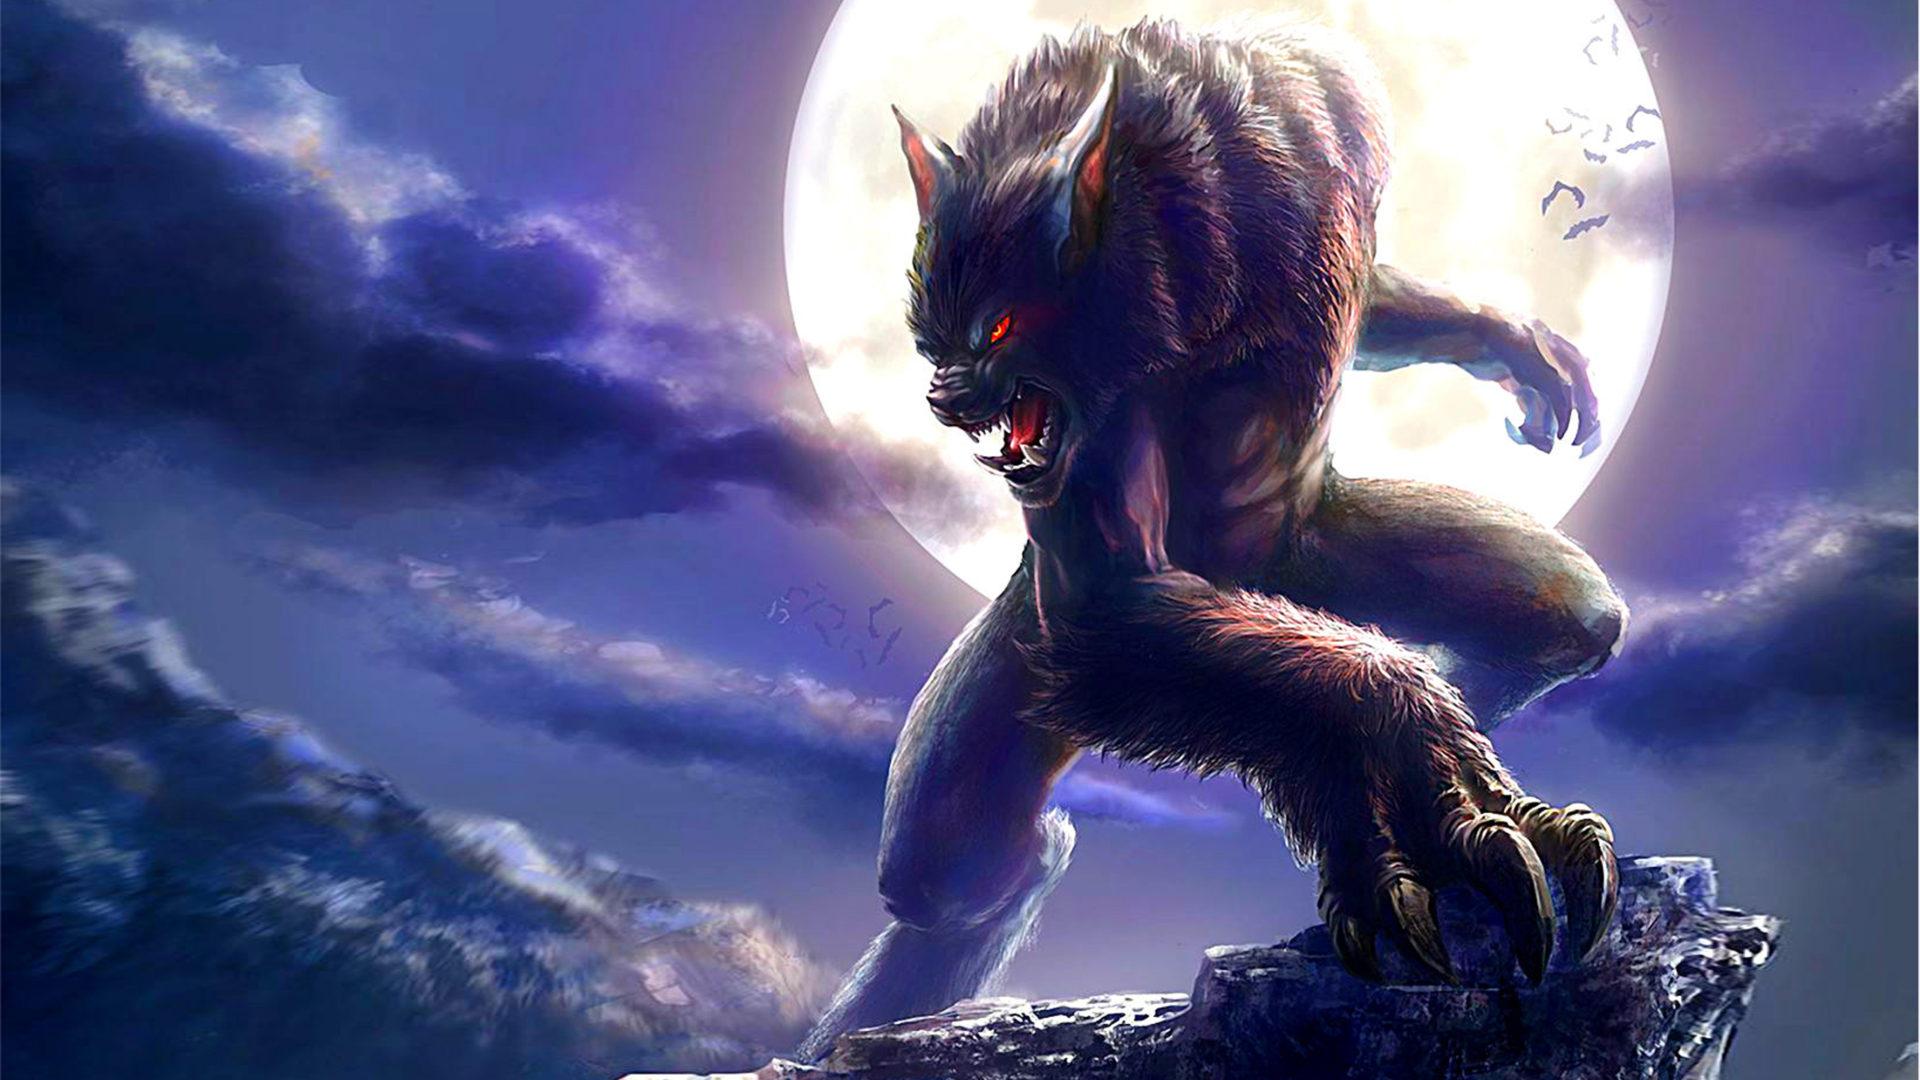 Wallpaper Pc Girl Dark Elf Werewolf Full Moon Fantasy Wallpaper For Desktop